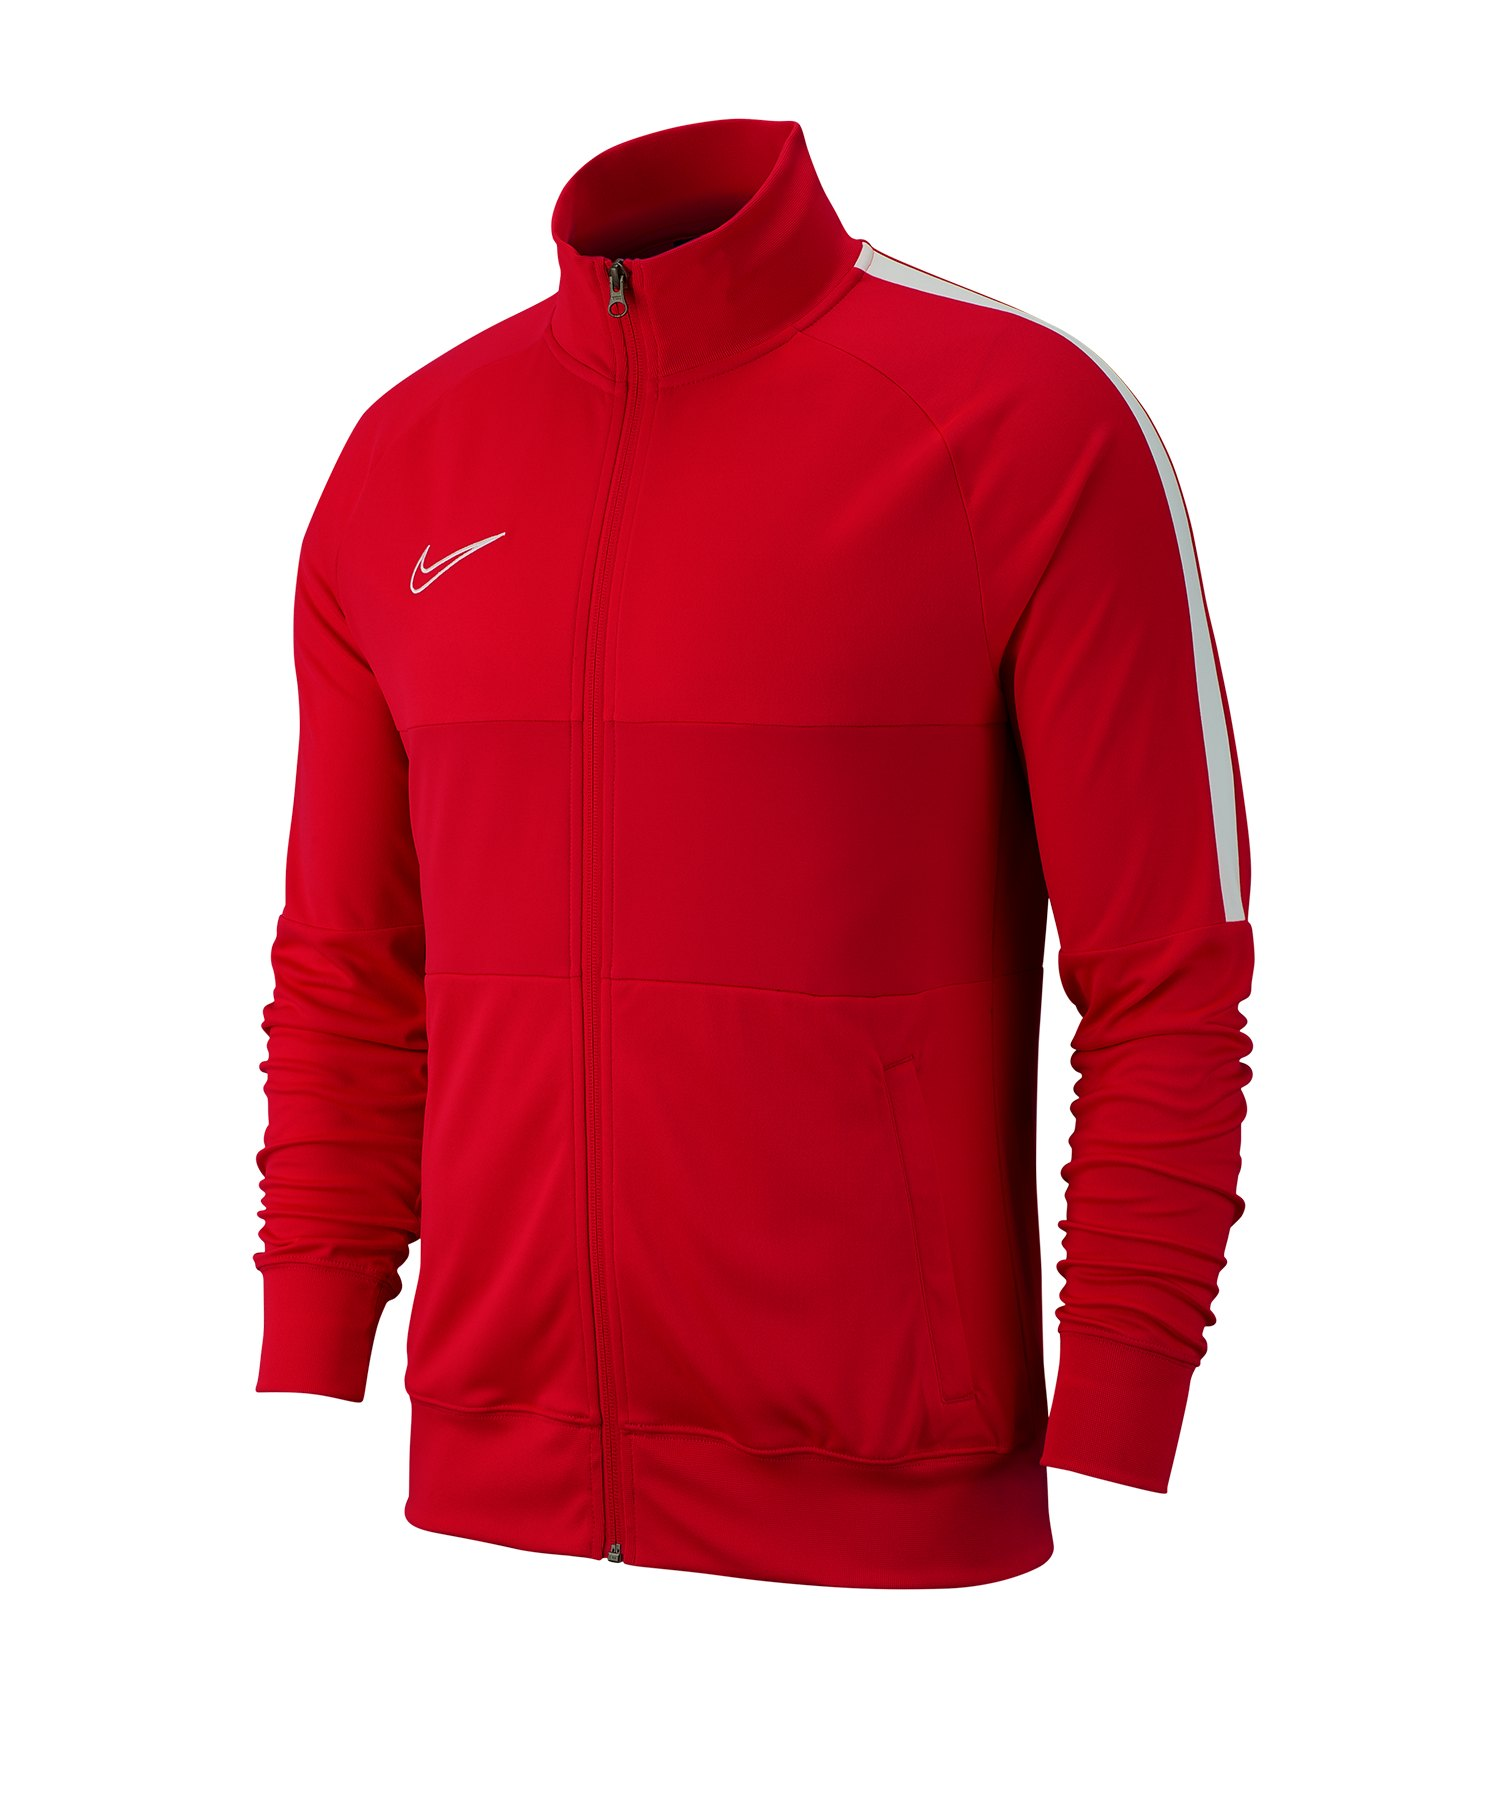 Nike Academy 19 Dri-FIT Jacke Kids Rot F657 - Rot